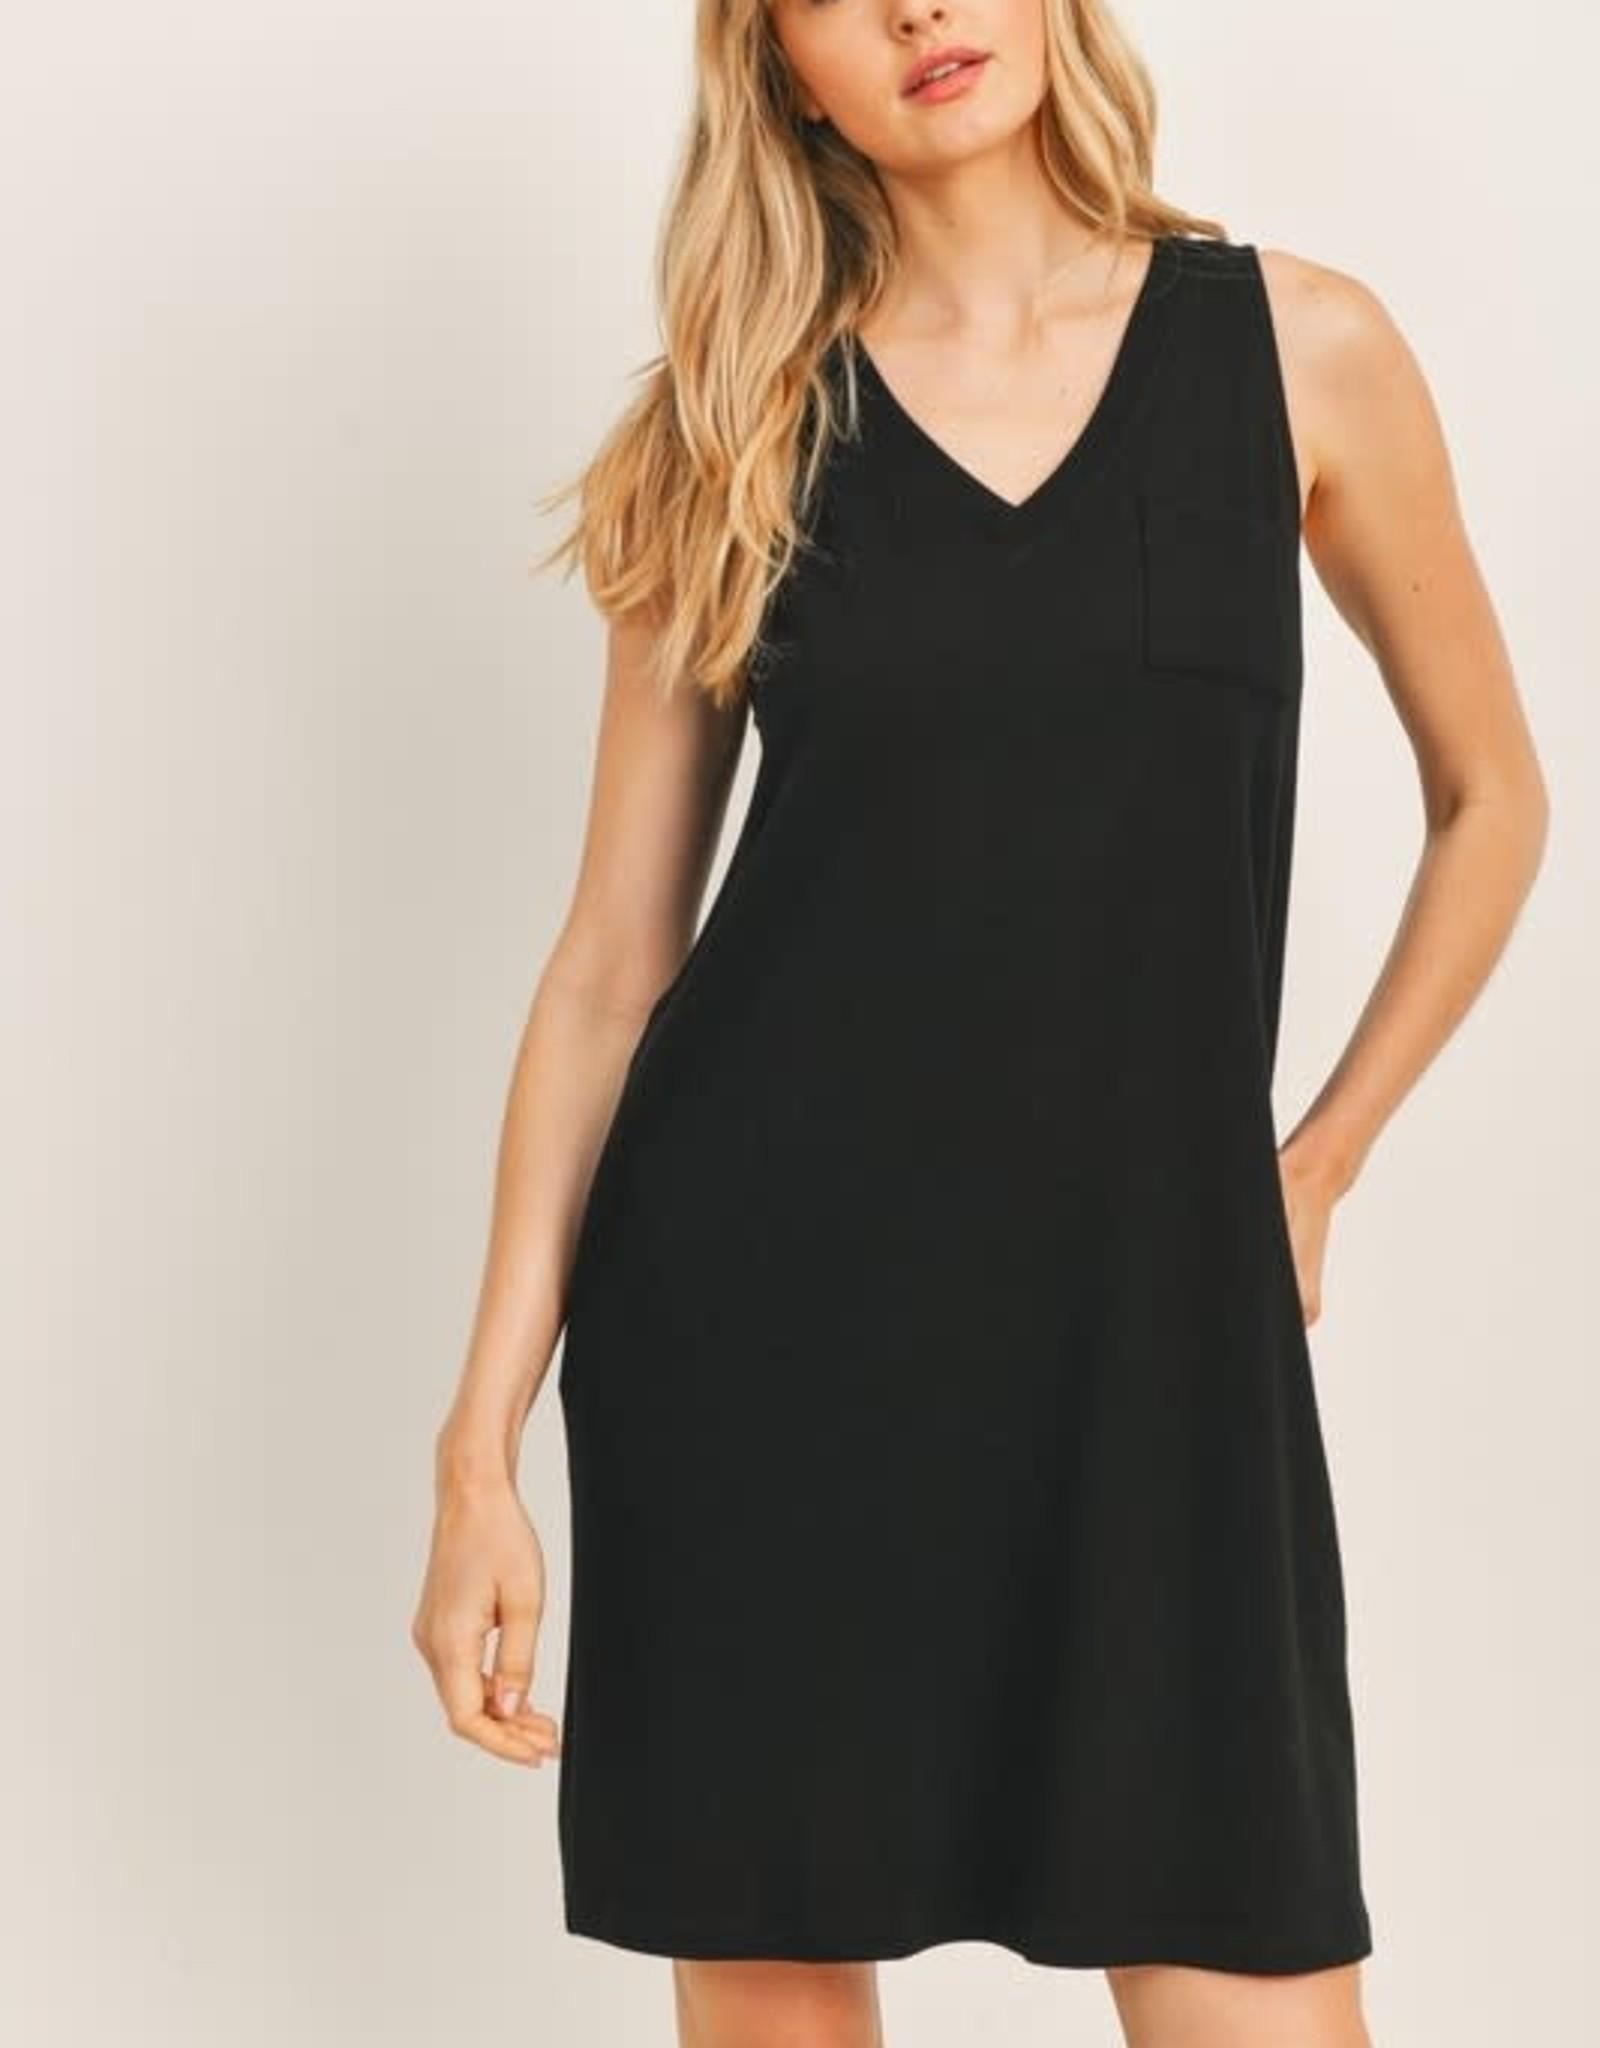 Miss Bliss V Neck French Terry Knit Dress- Black